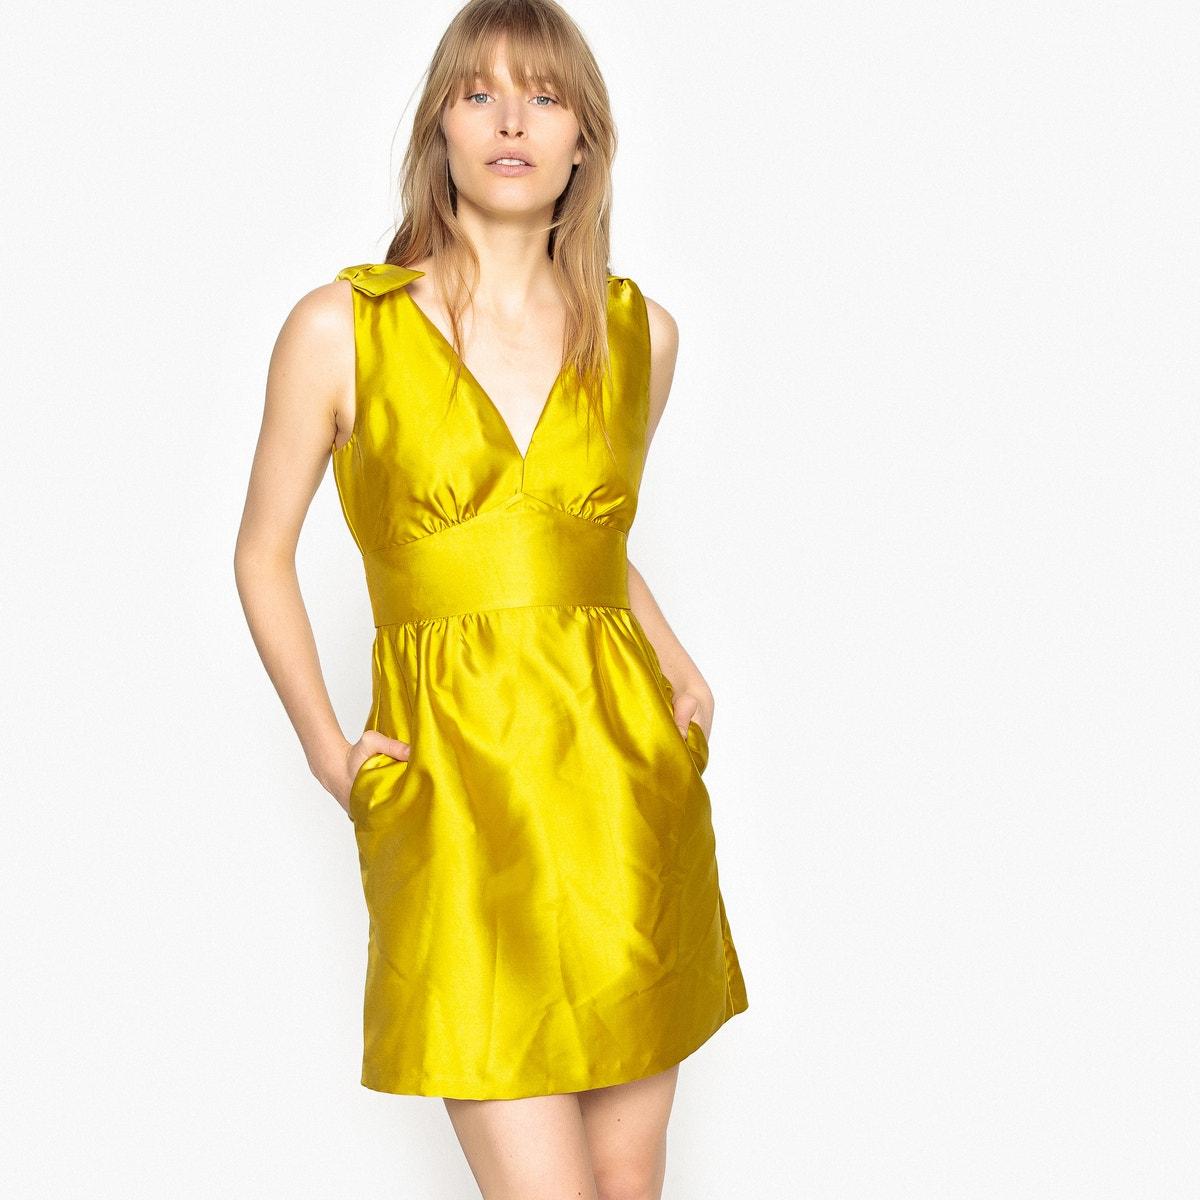 dc59fd57aab3 Γυναικεία Φορέματα - Σελίδα 779